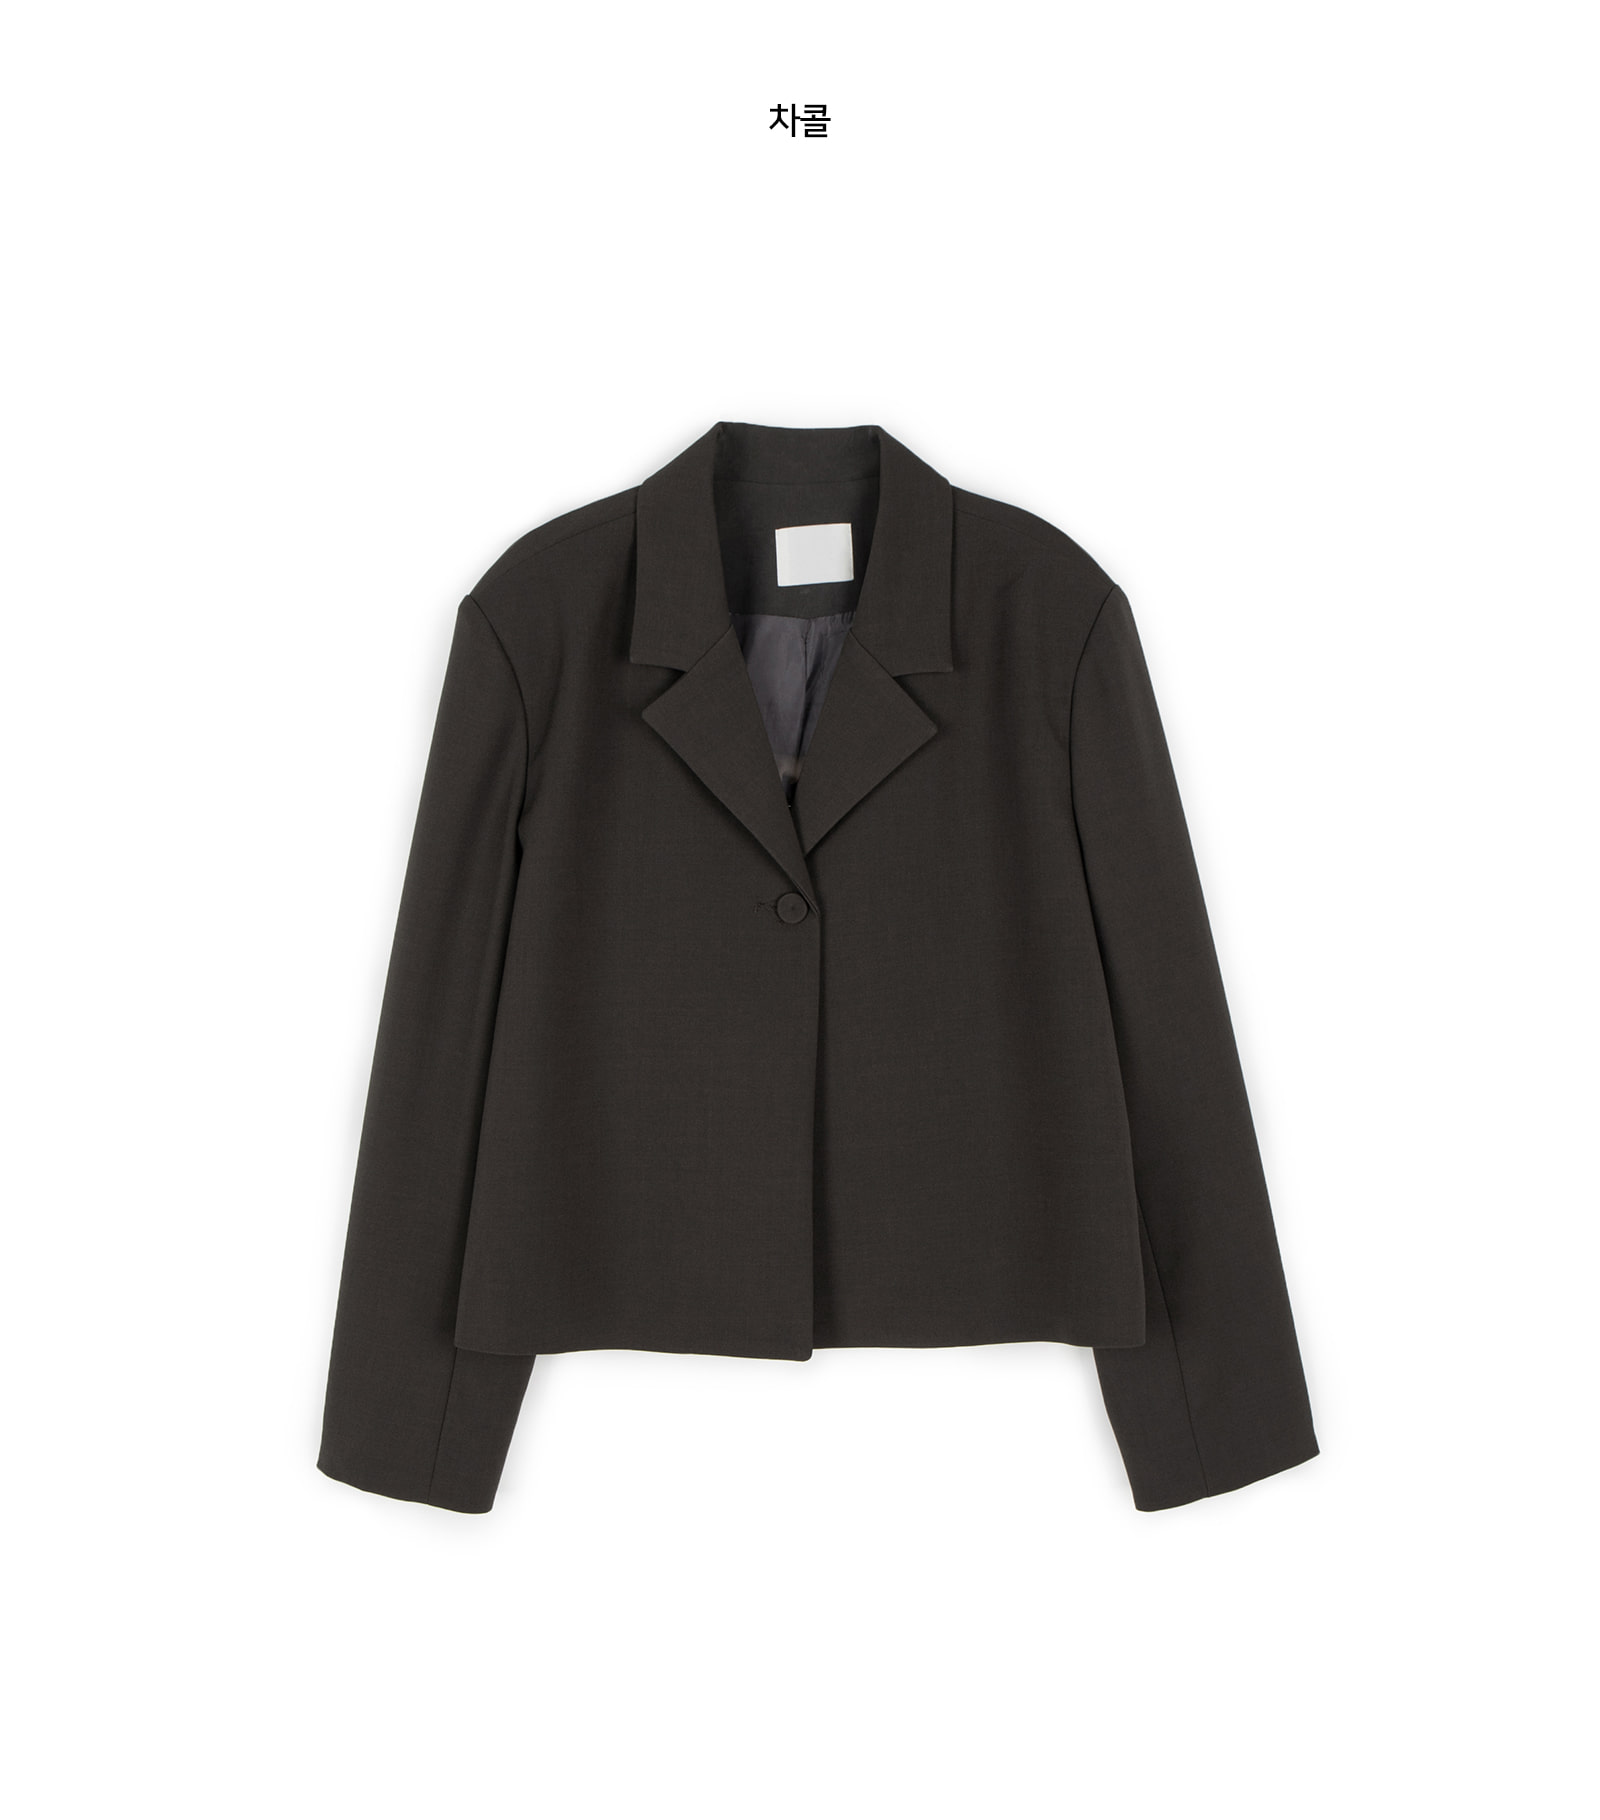 Marang one-button cropped single jacket